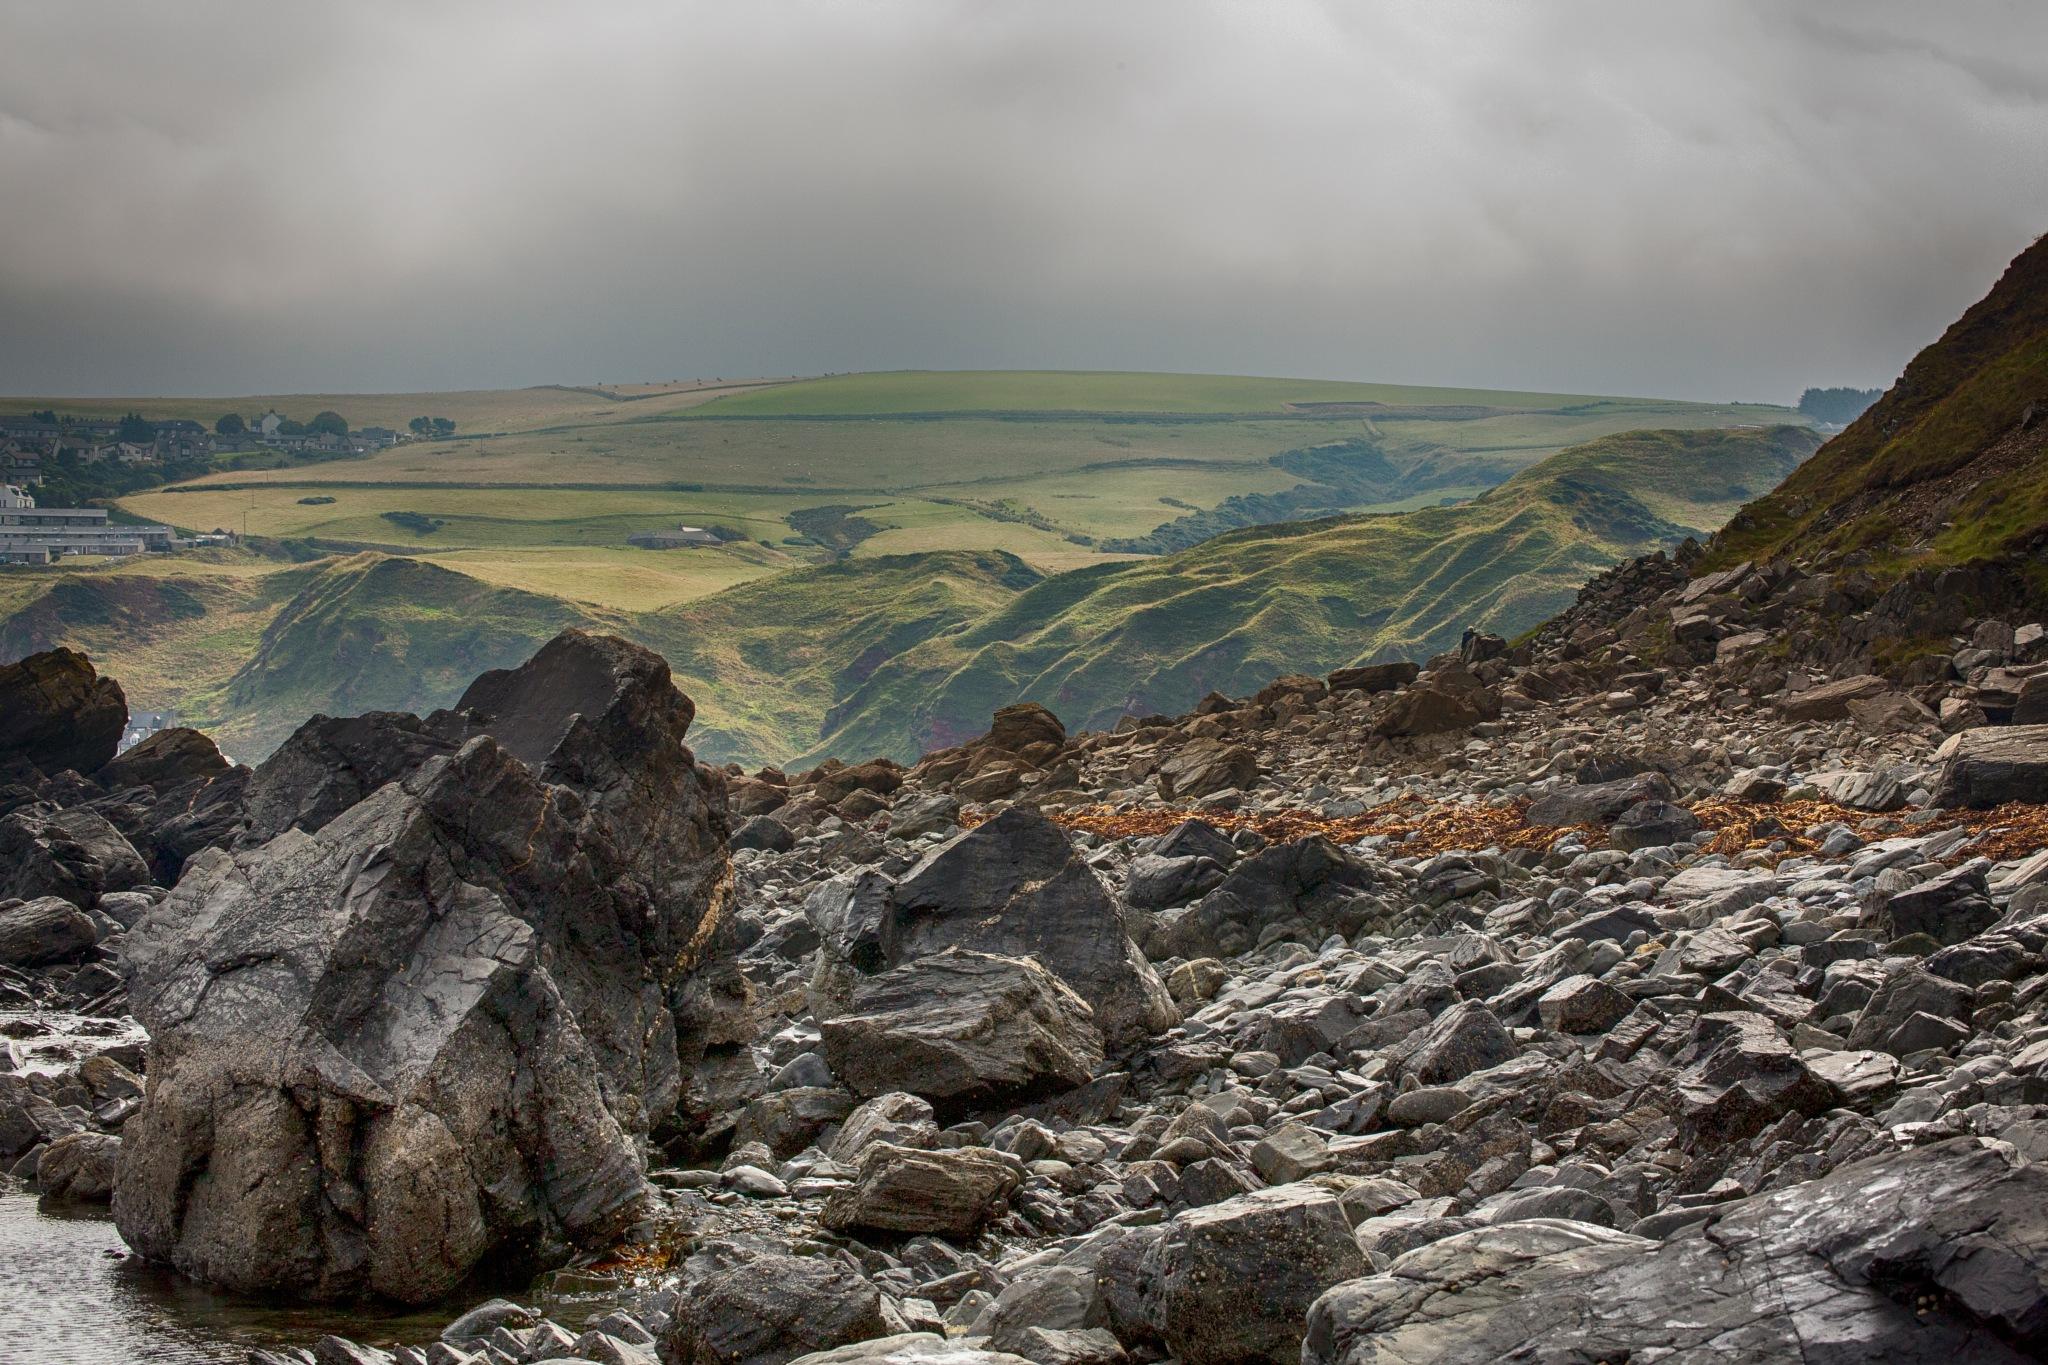 Beyond The Rocks by photogaphotography